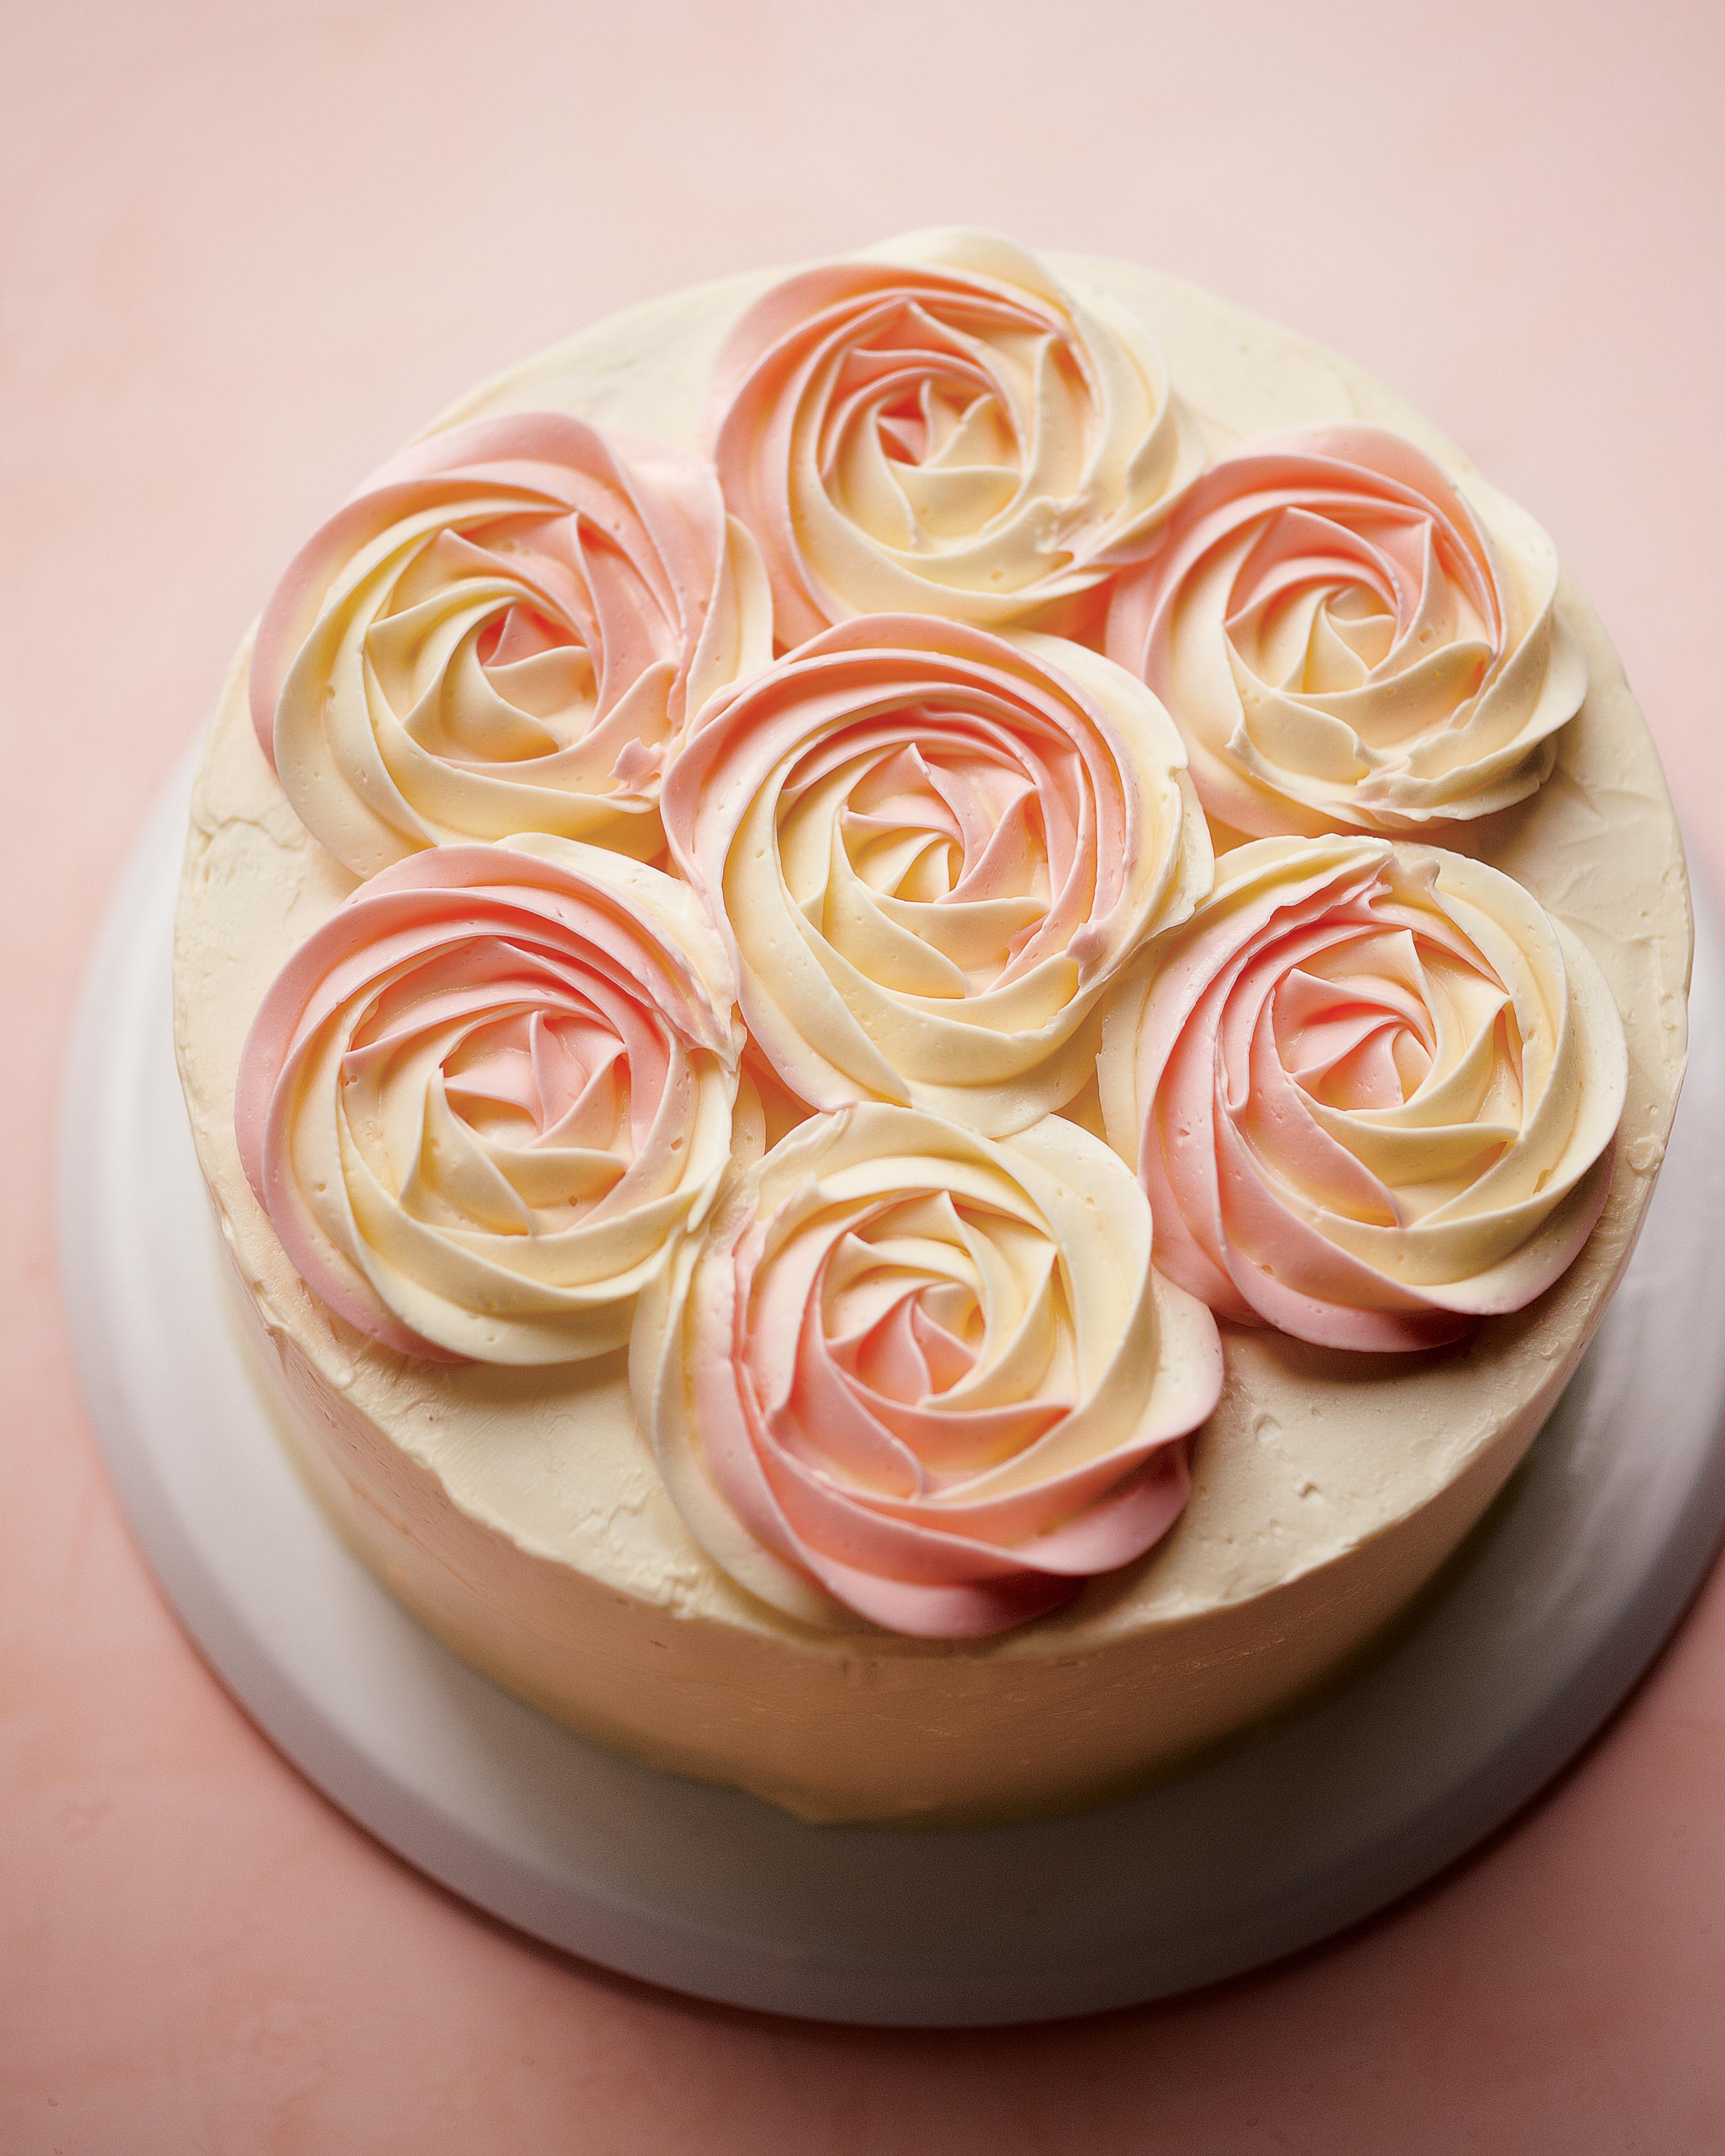 rum-rose-cake-mscakes-231-r3.jpg